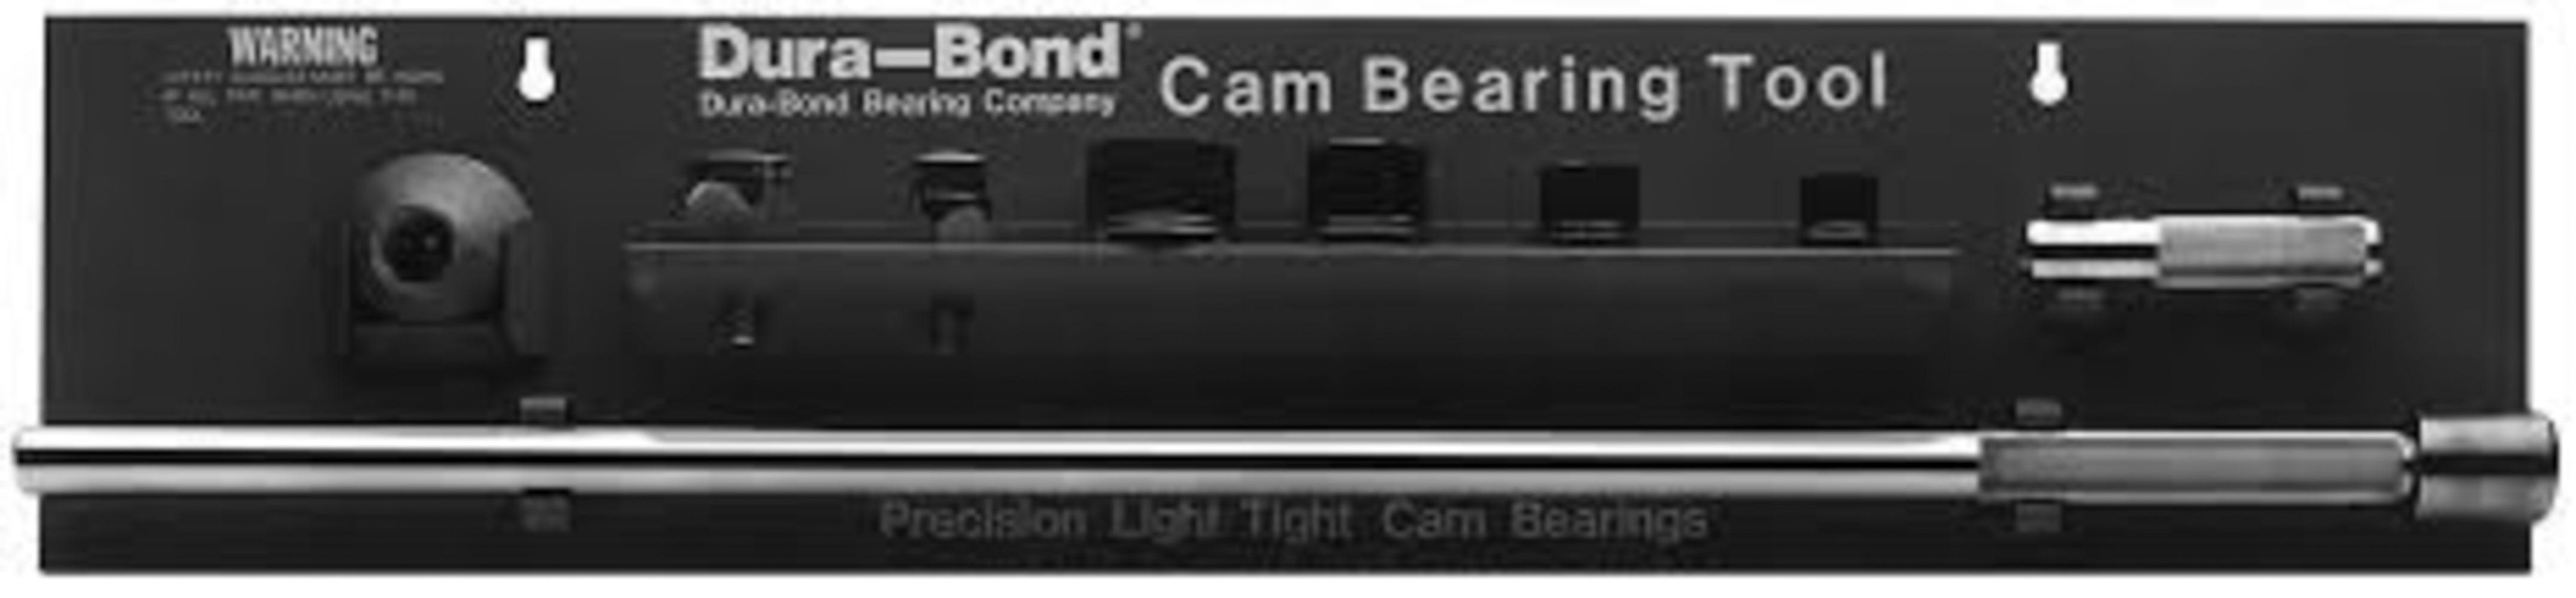 Dura-bond Cam Bearing Installation & Removal Tool Kit